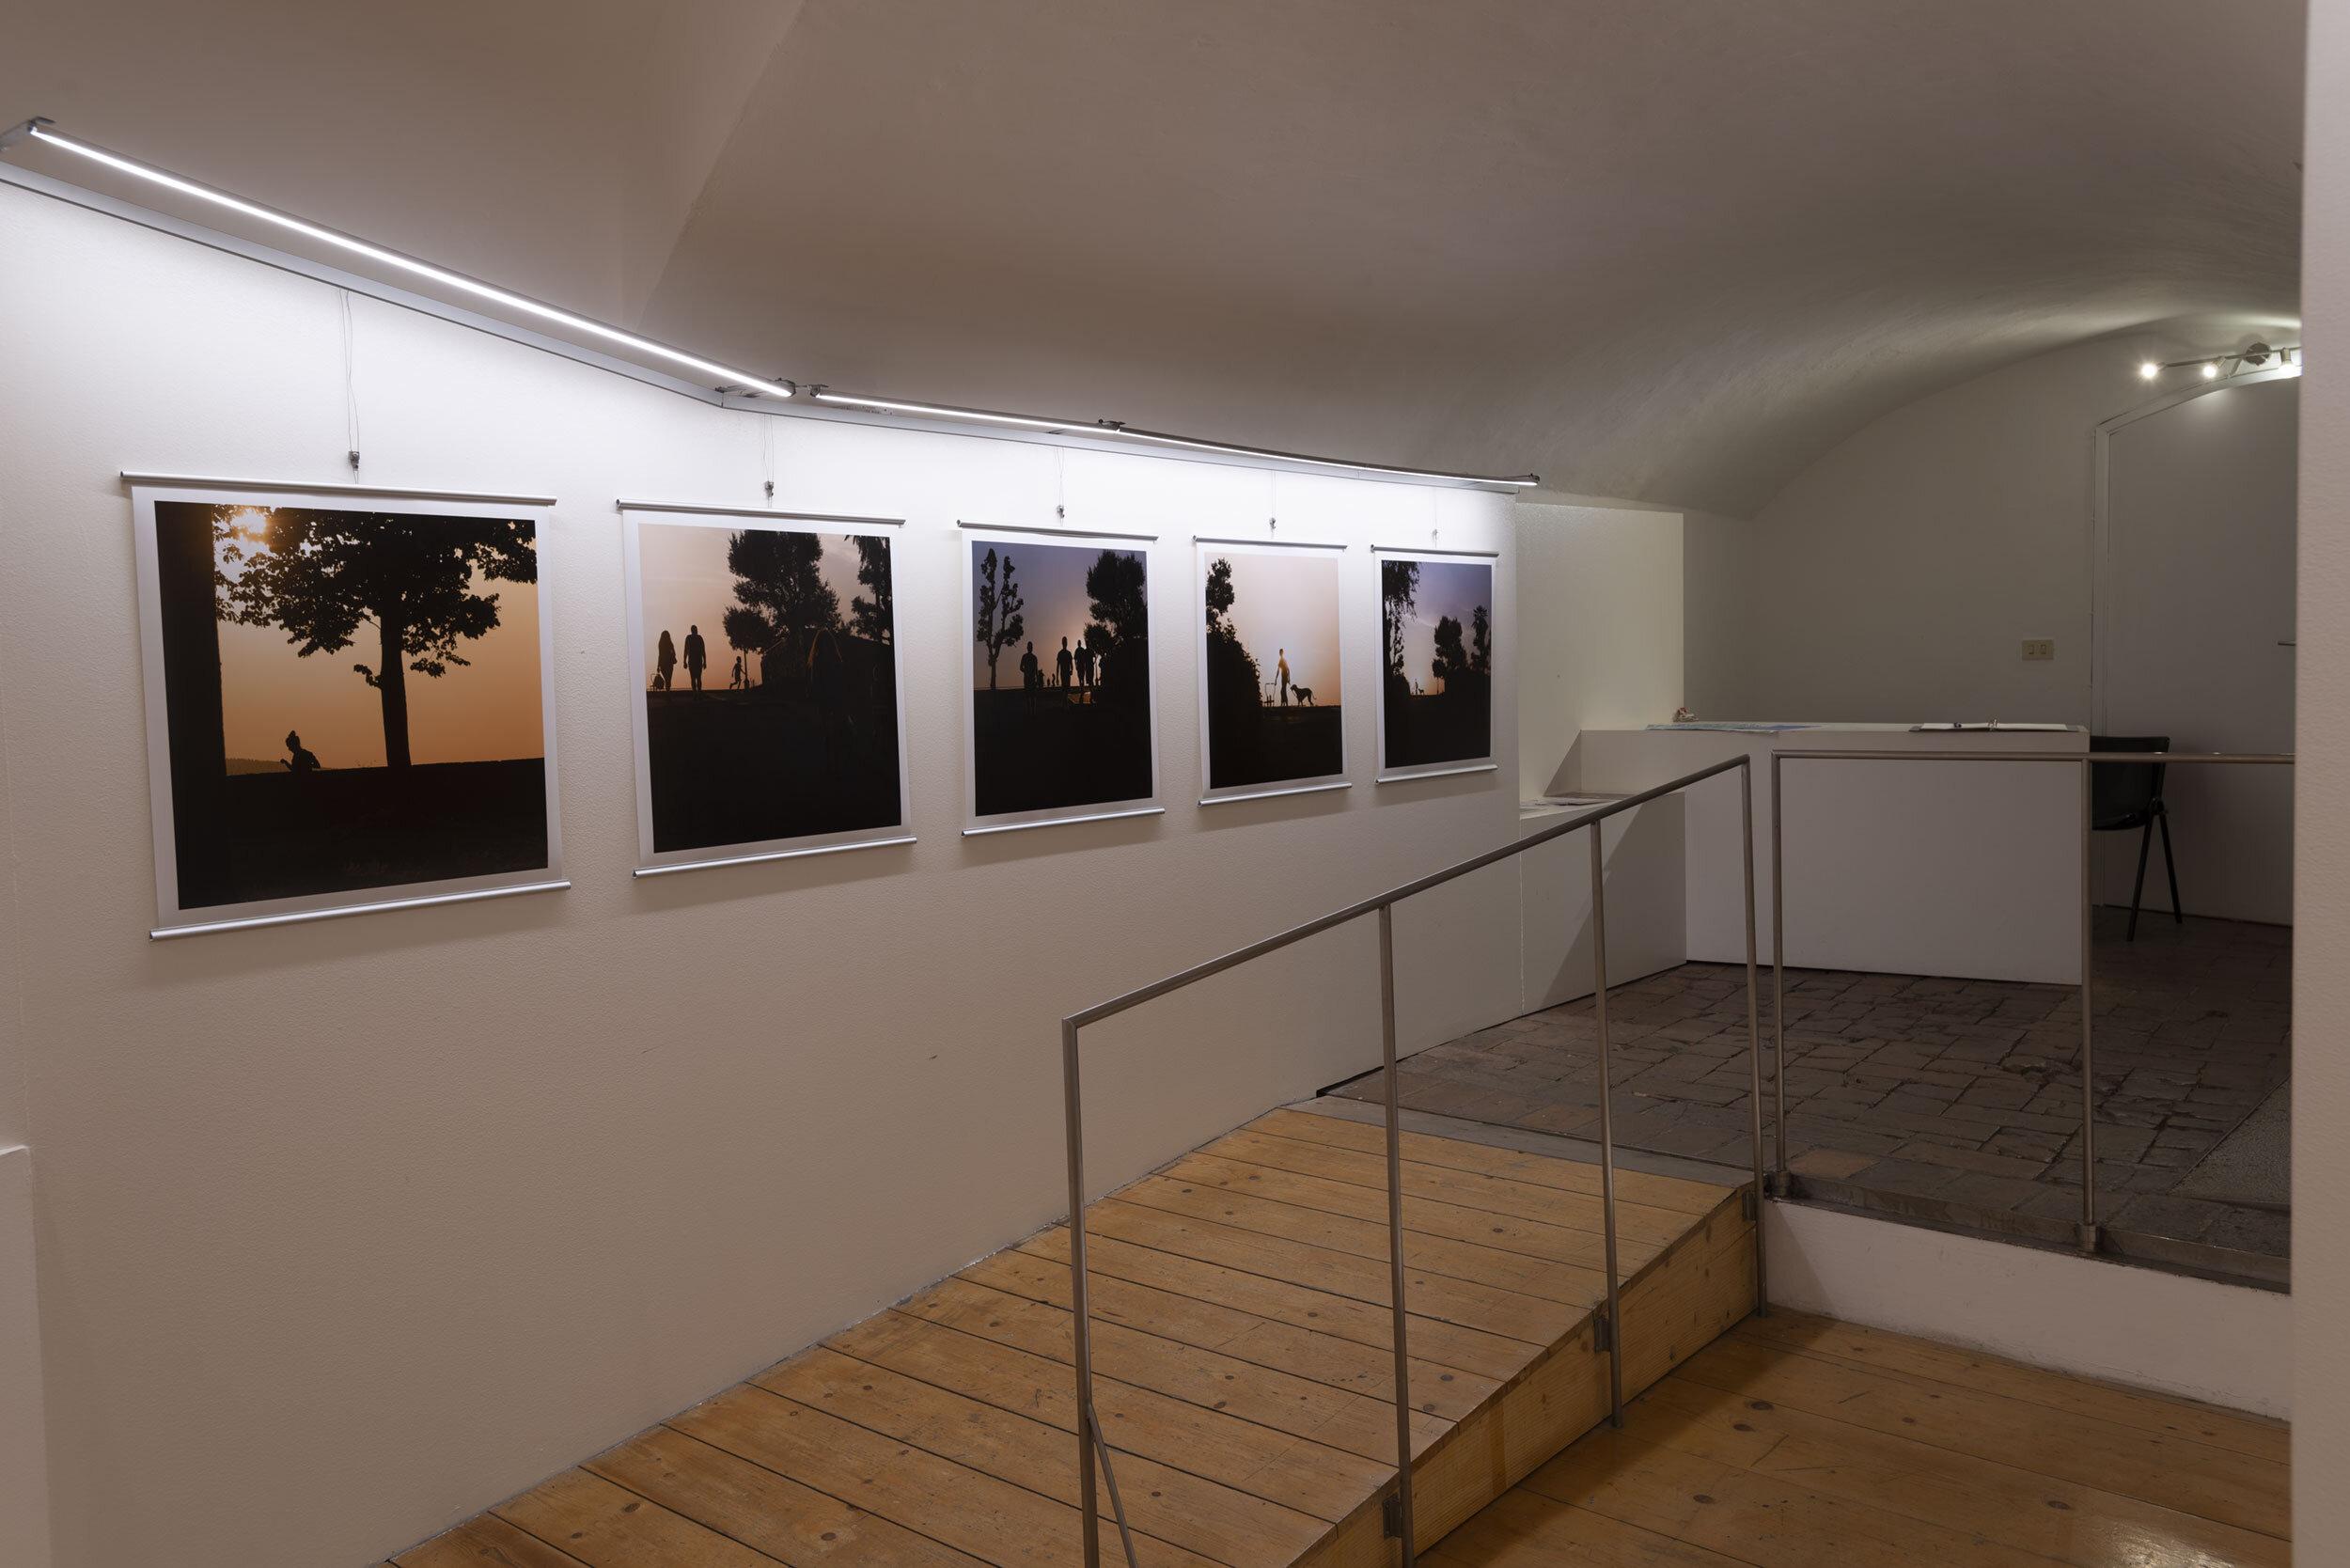 I Crepuscolari (TwiLight) exhibition at the Via di Citta` 75, 5300 Siena, Italy, Olmastroni Gallery (August 25 to September 8, 2019).